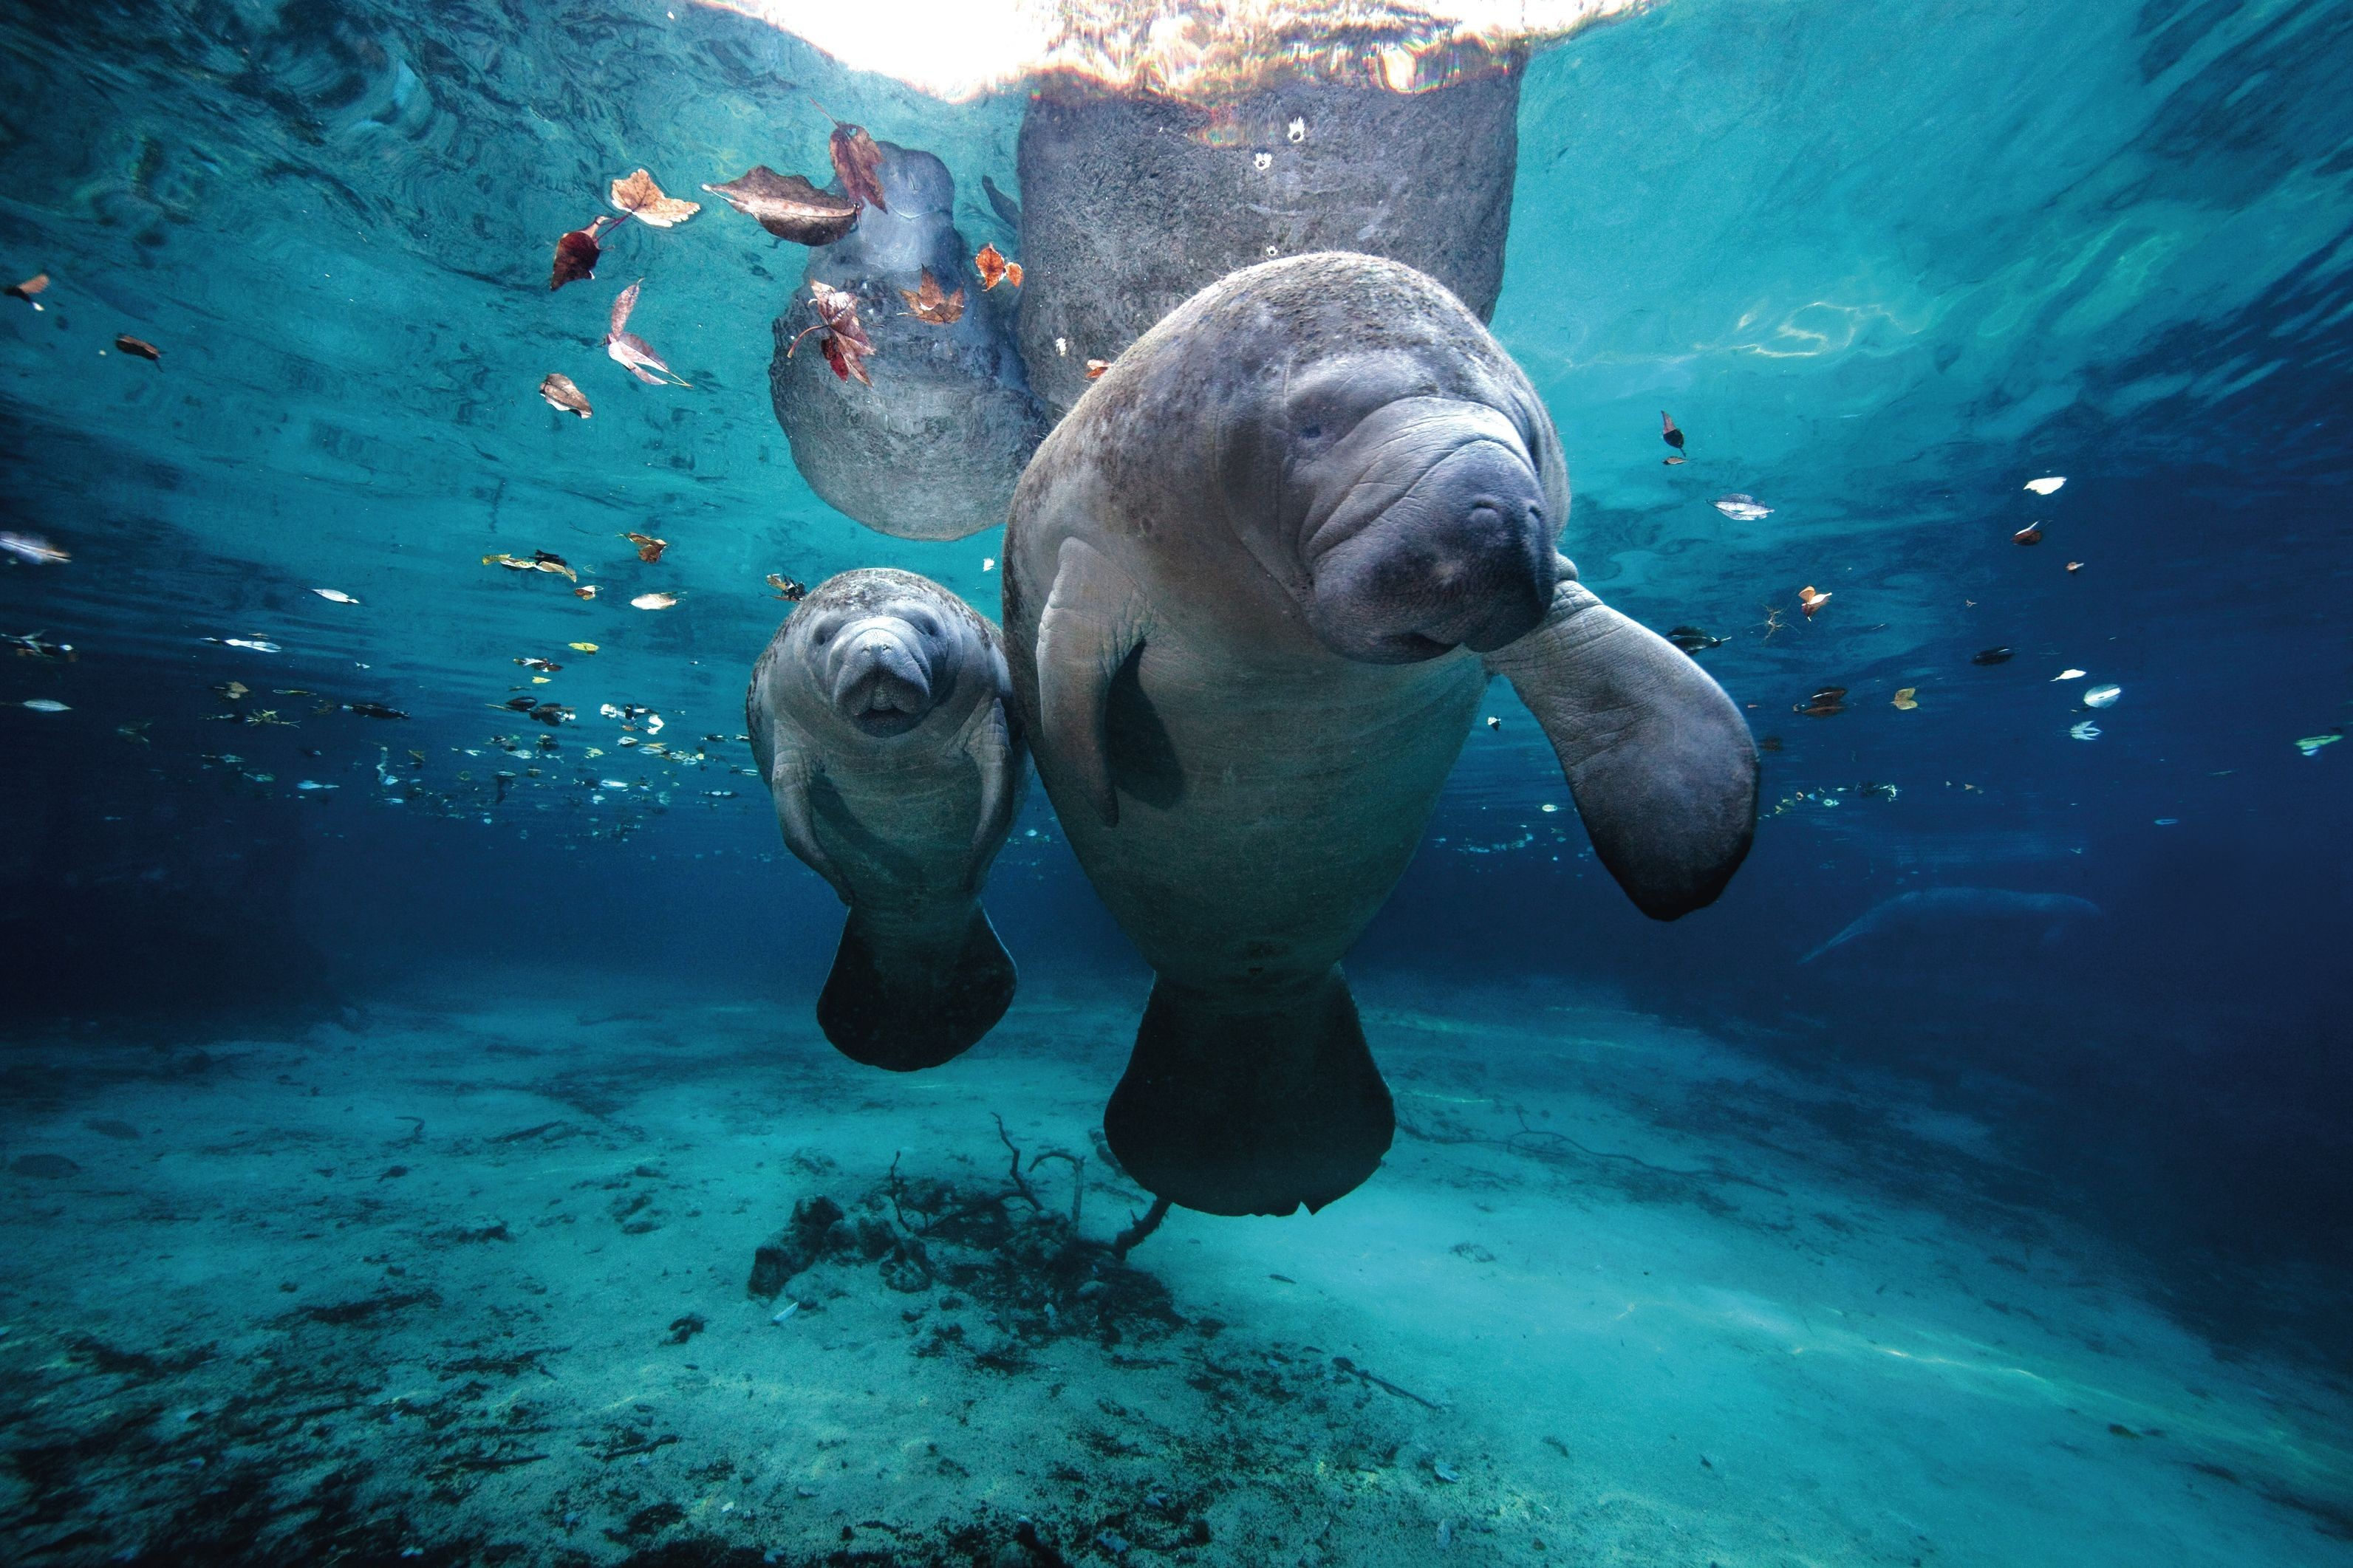 Top 27 Sea Animals Wallpapers In Hd: Sea Animal Wallpaper